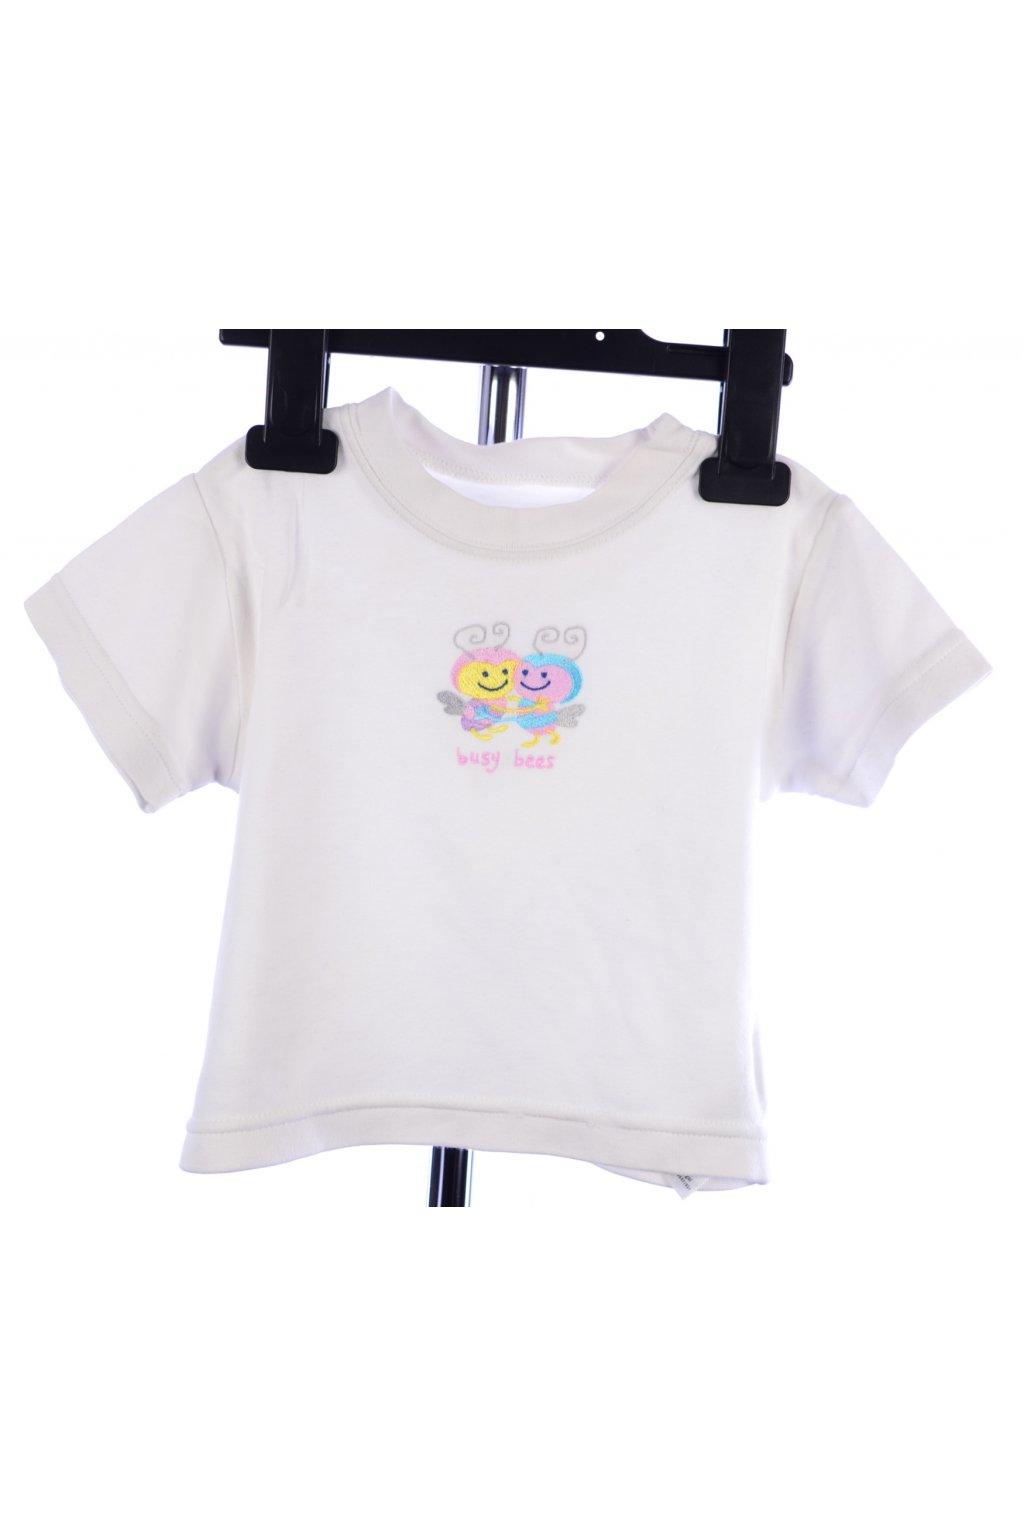 Tričko Tesco vel 74 bílé s včelkami